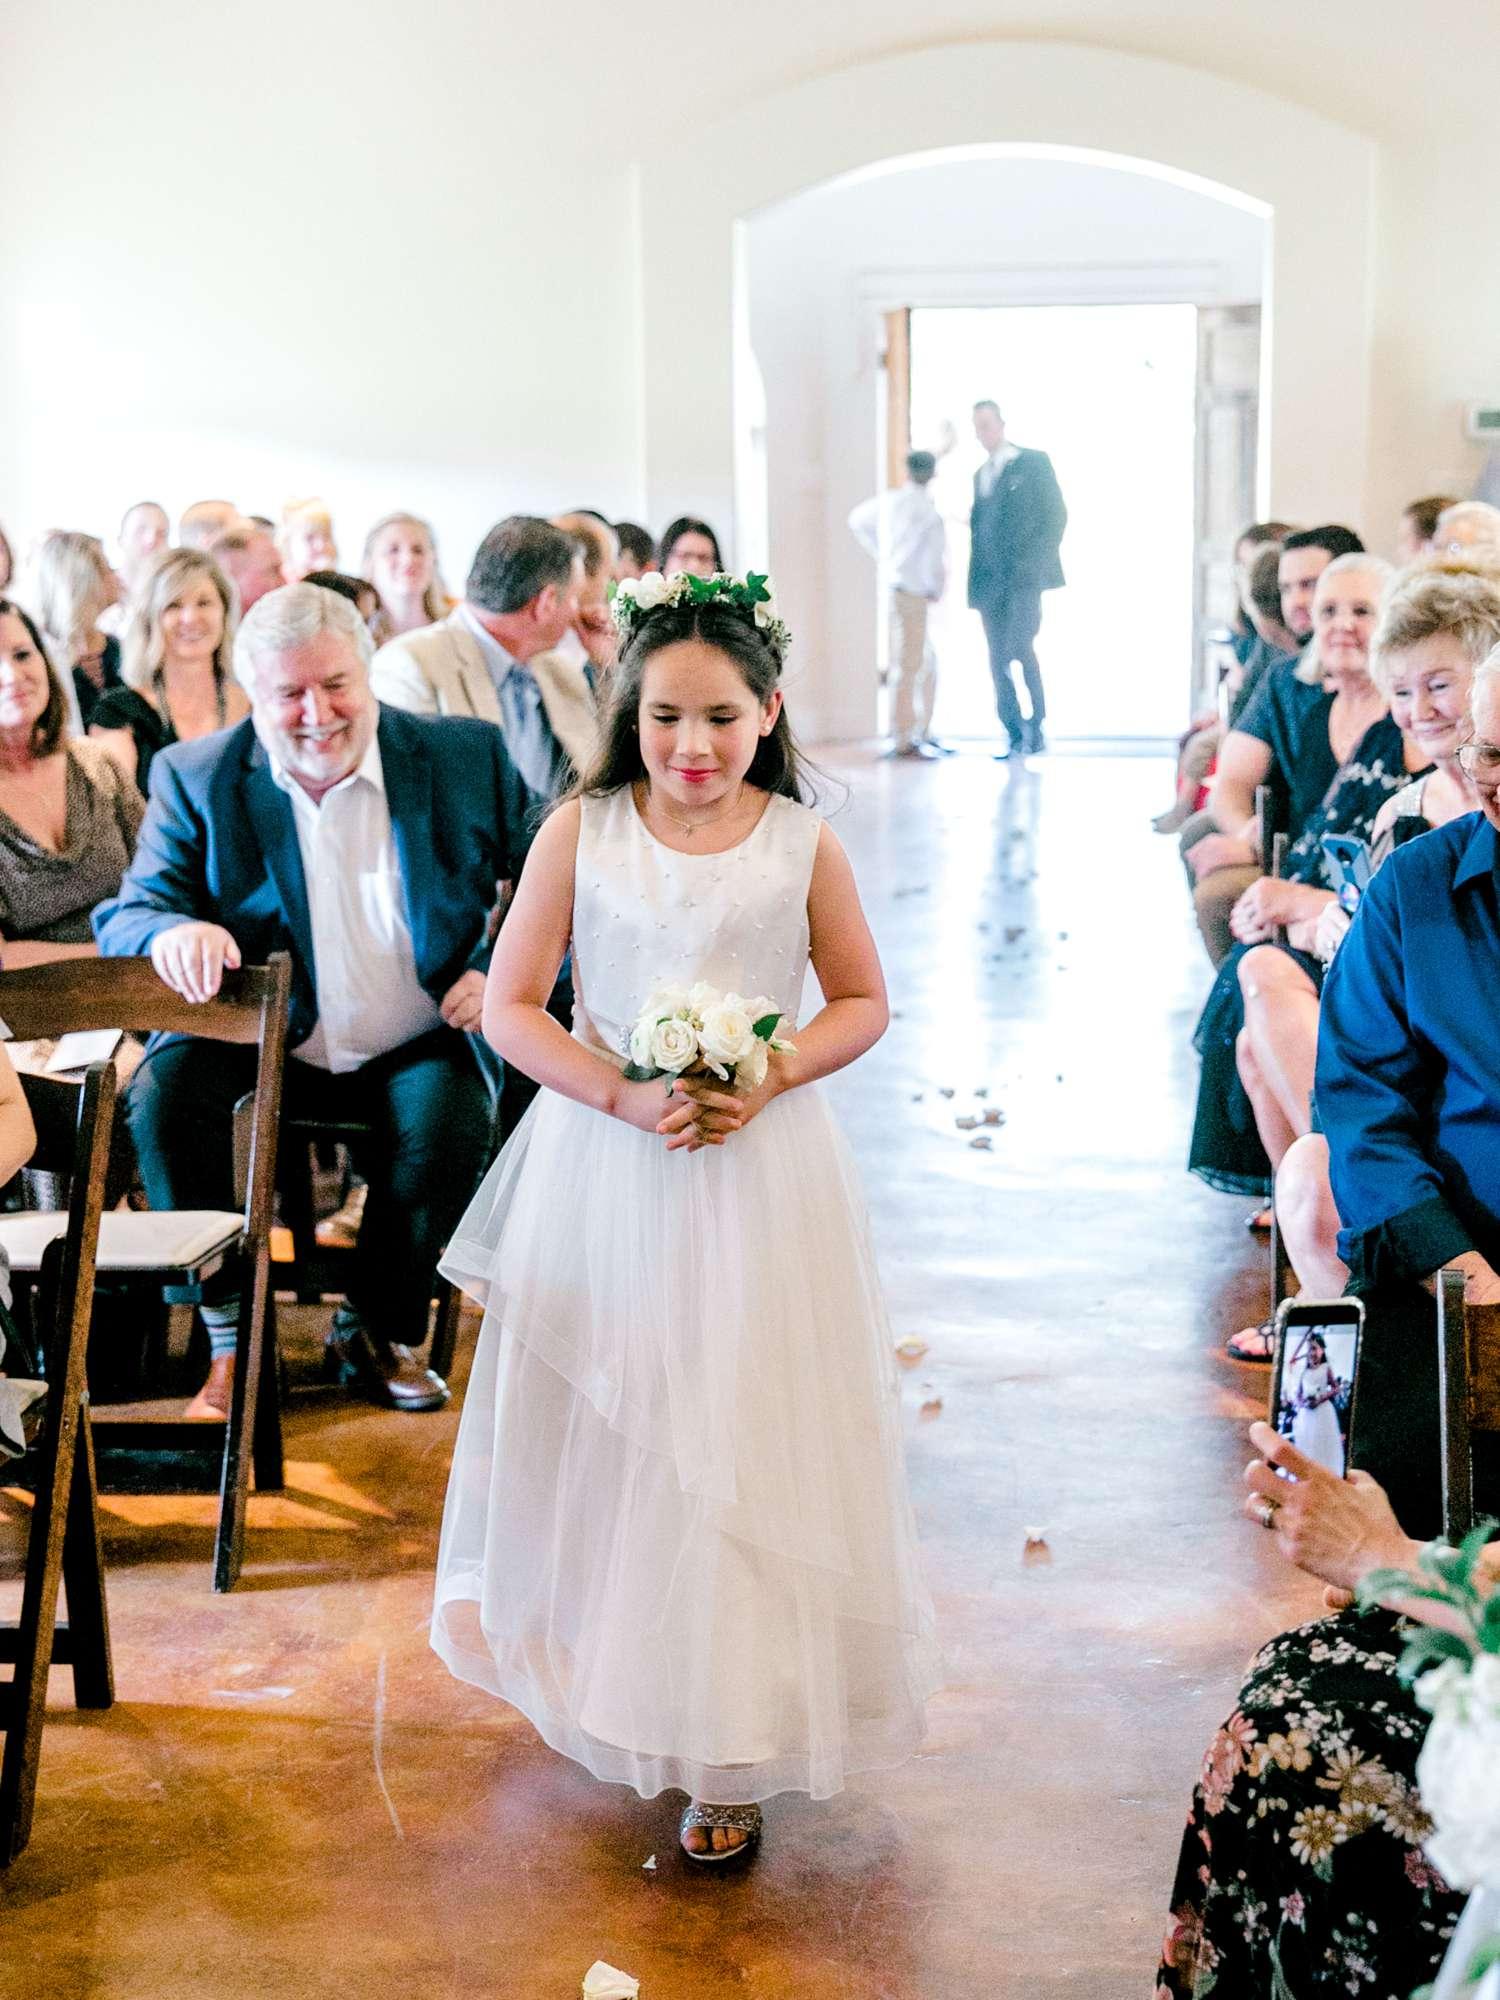 HAYLEE+JUSTIN+GREGORY+HERITAGE_HAUS_AUSTIN_TEXAS_WEDDING_0062.jpg